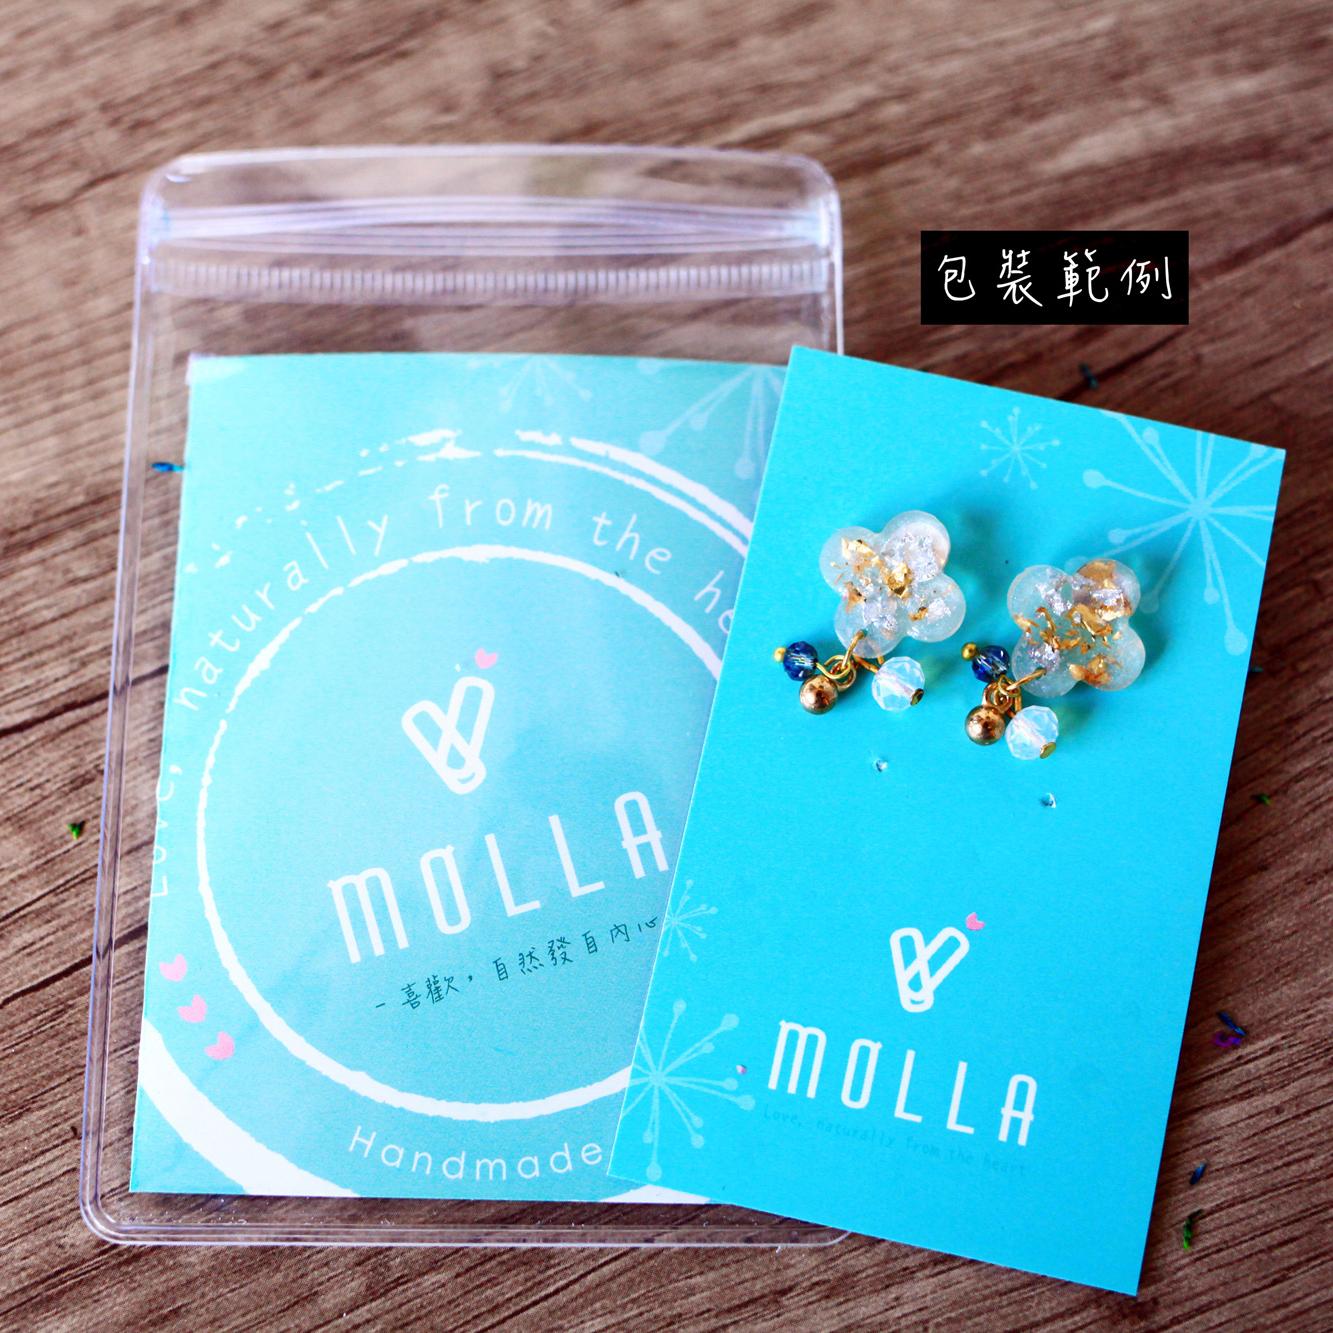 Molla 大玫瑰婁空水滴耳環-蒂芬妮綠(FLAMENCO佛朗明哥舞者最愛-純銀針手工訂製)